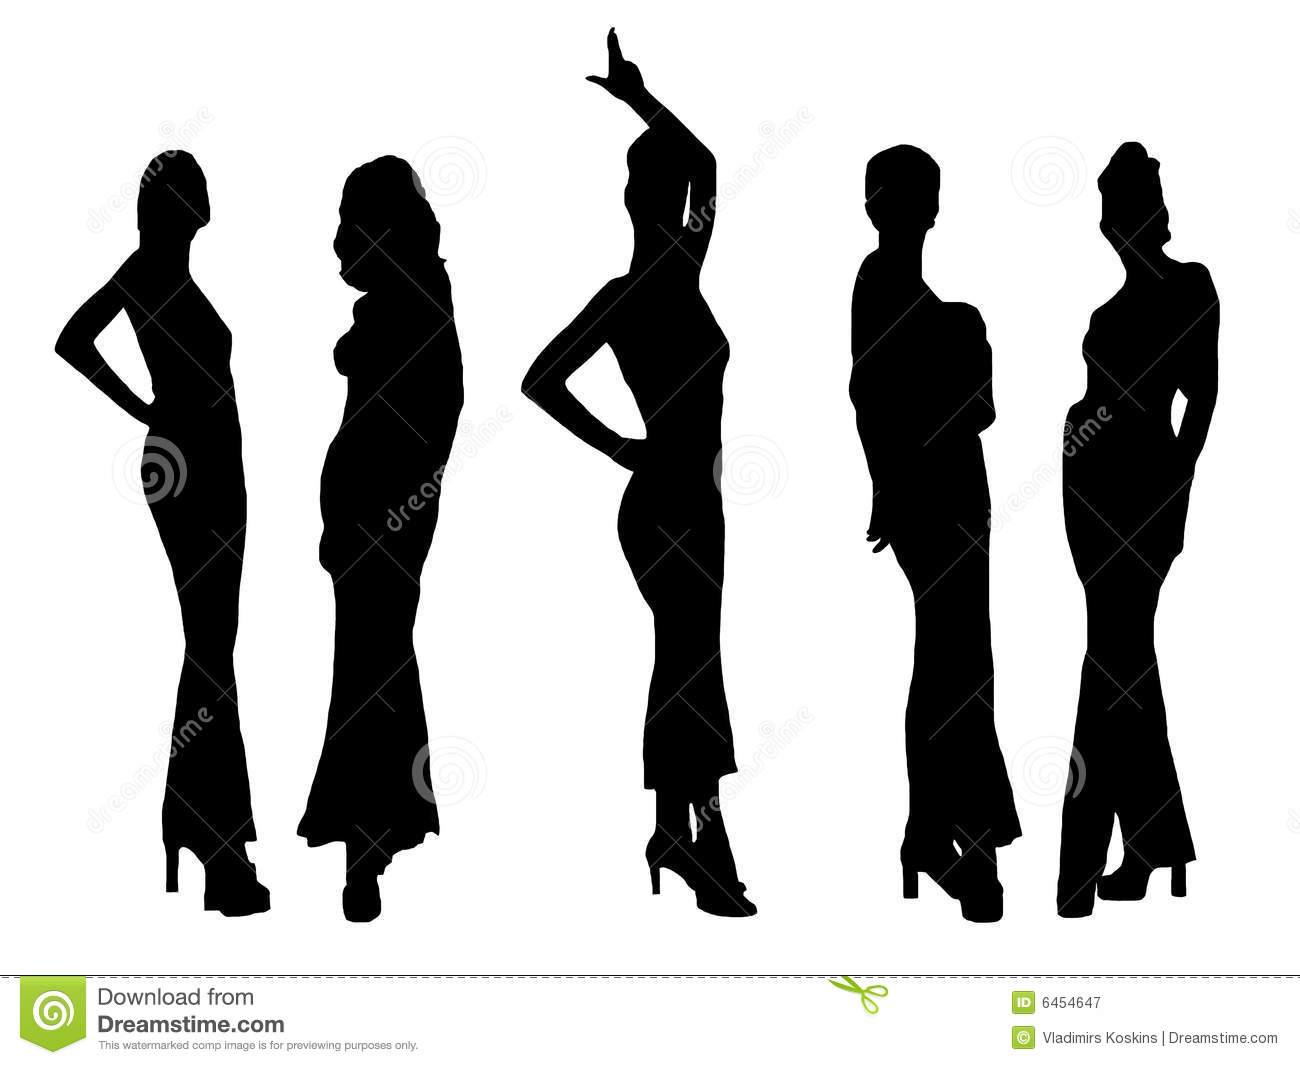 Ladies fashion clipart free . Download